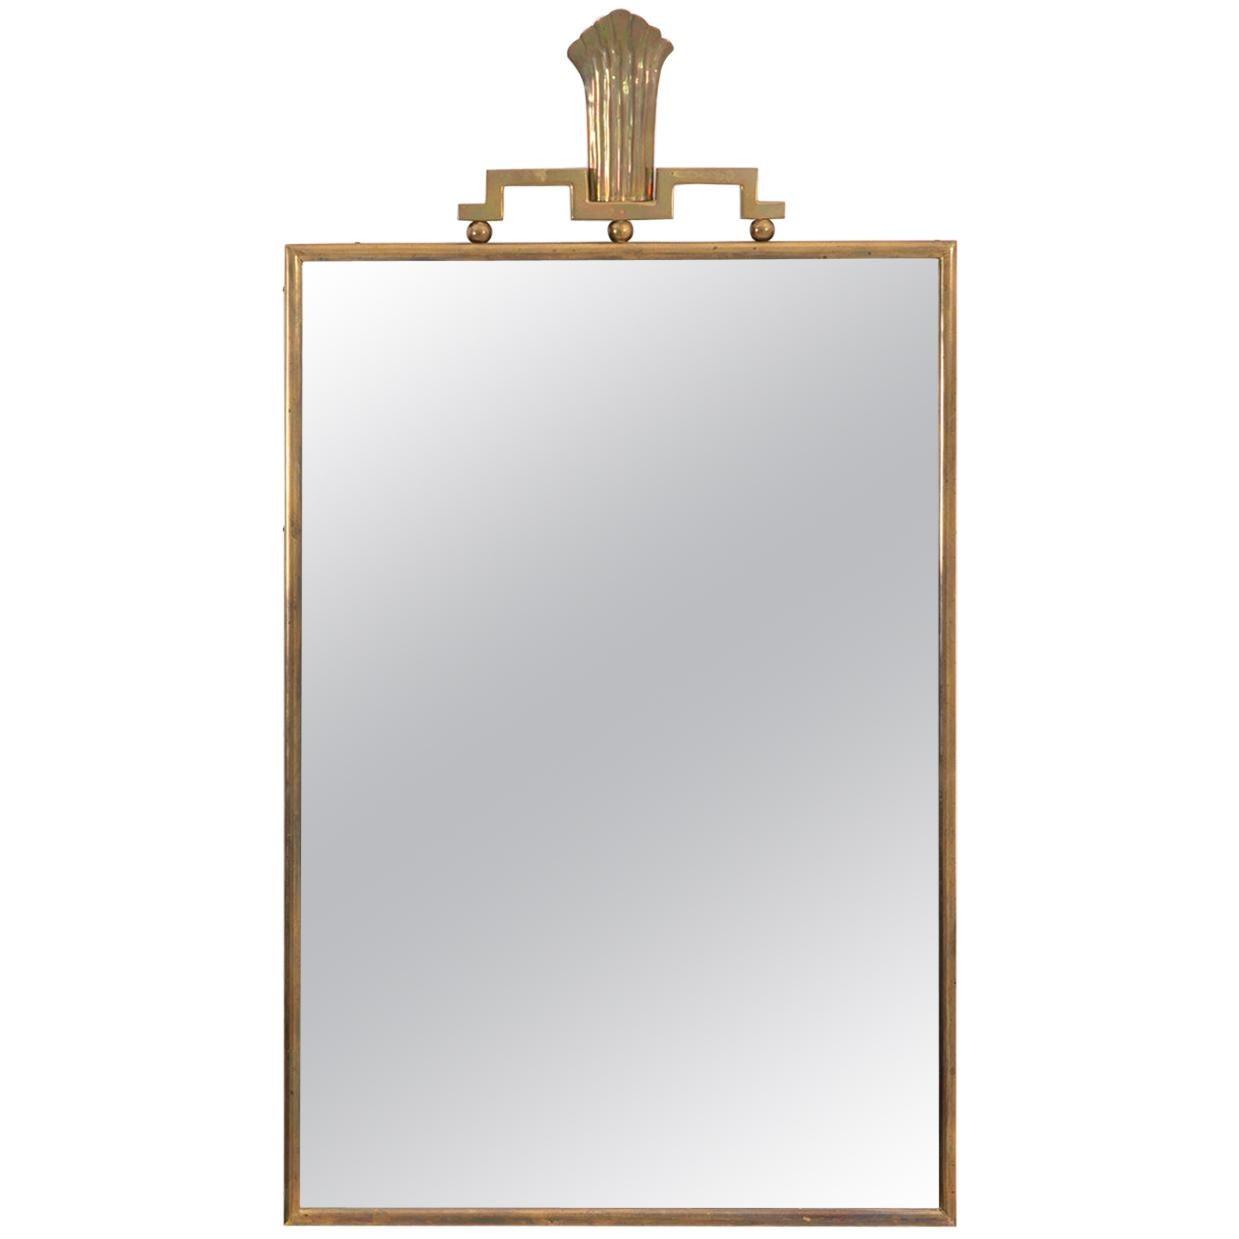 Swedish Grace Brass Mirror by Lars Holmström, 1930s